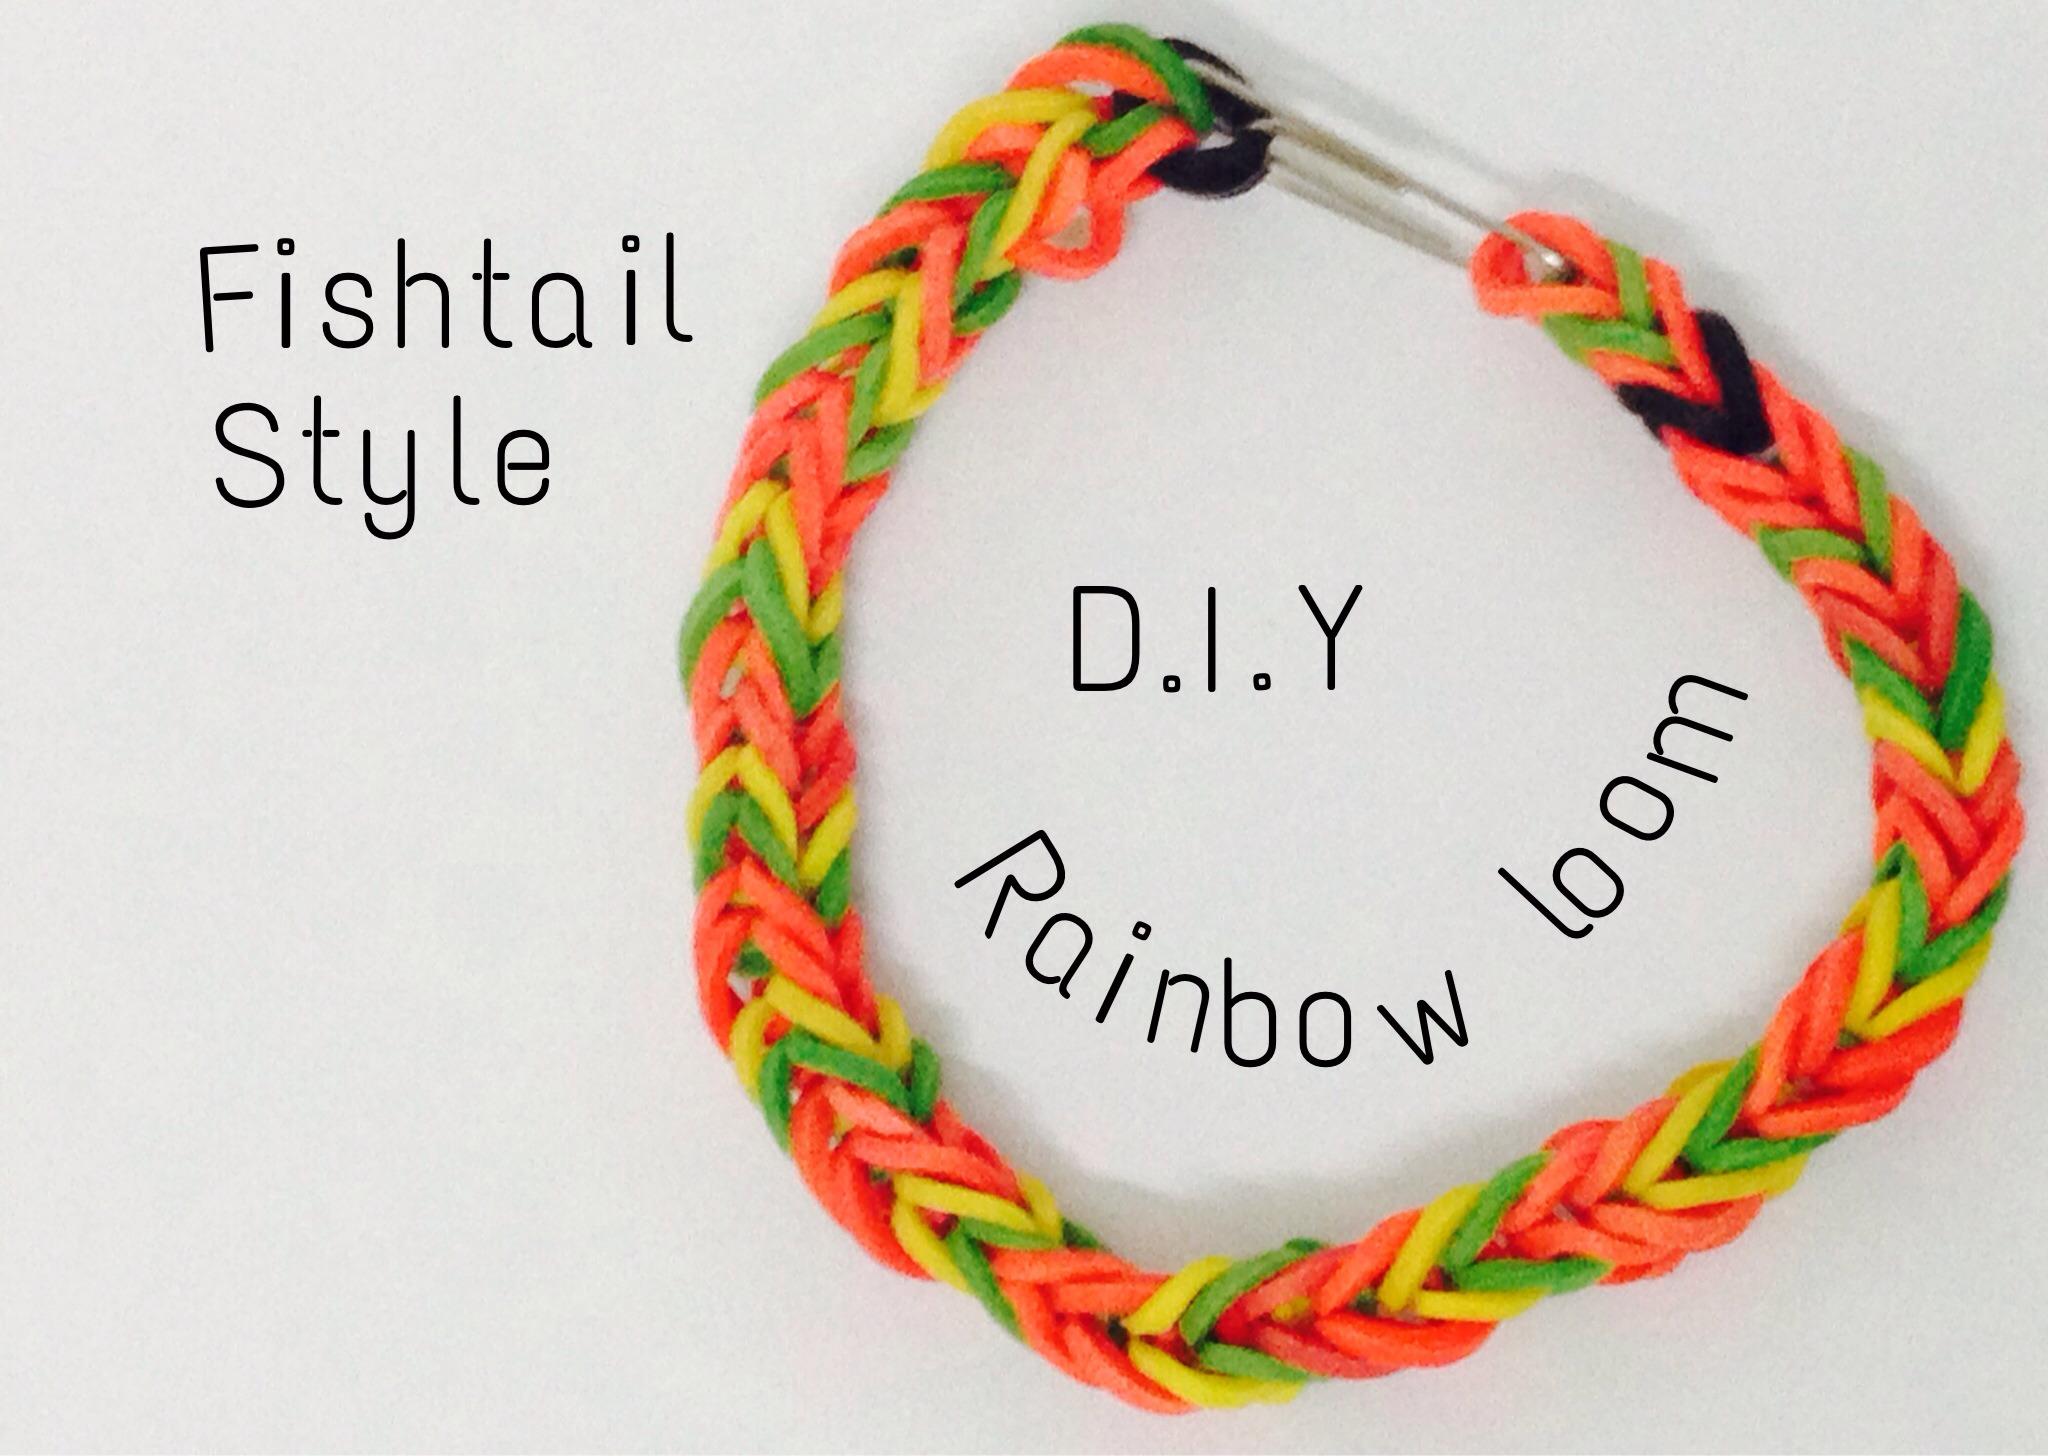 Rainbow Loom Bracelet (with Fingers)